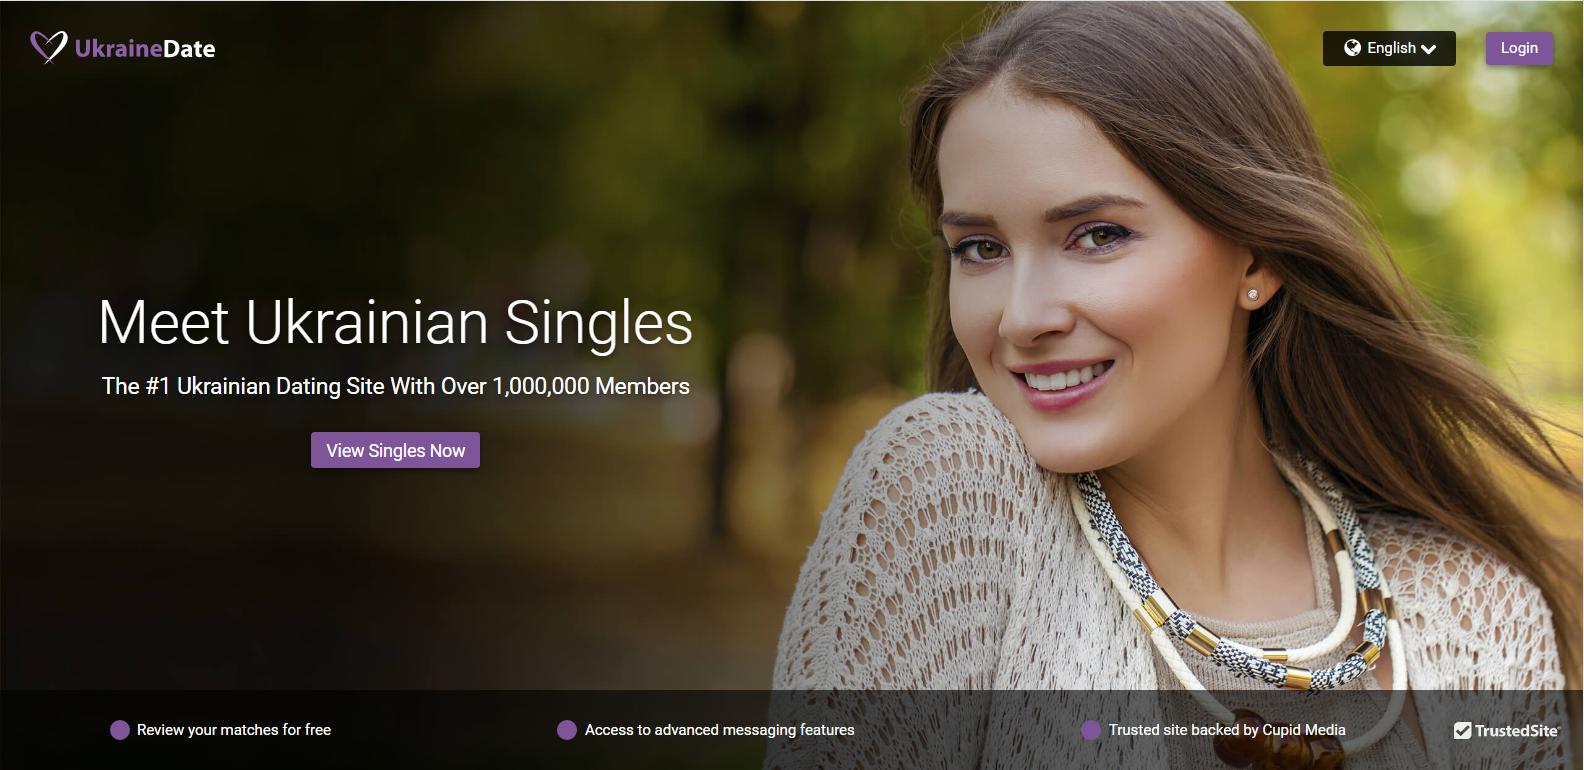 ucraineană dating site recenzii